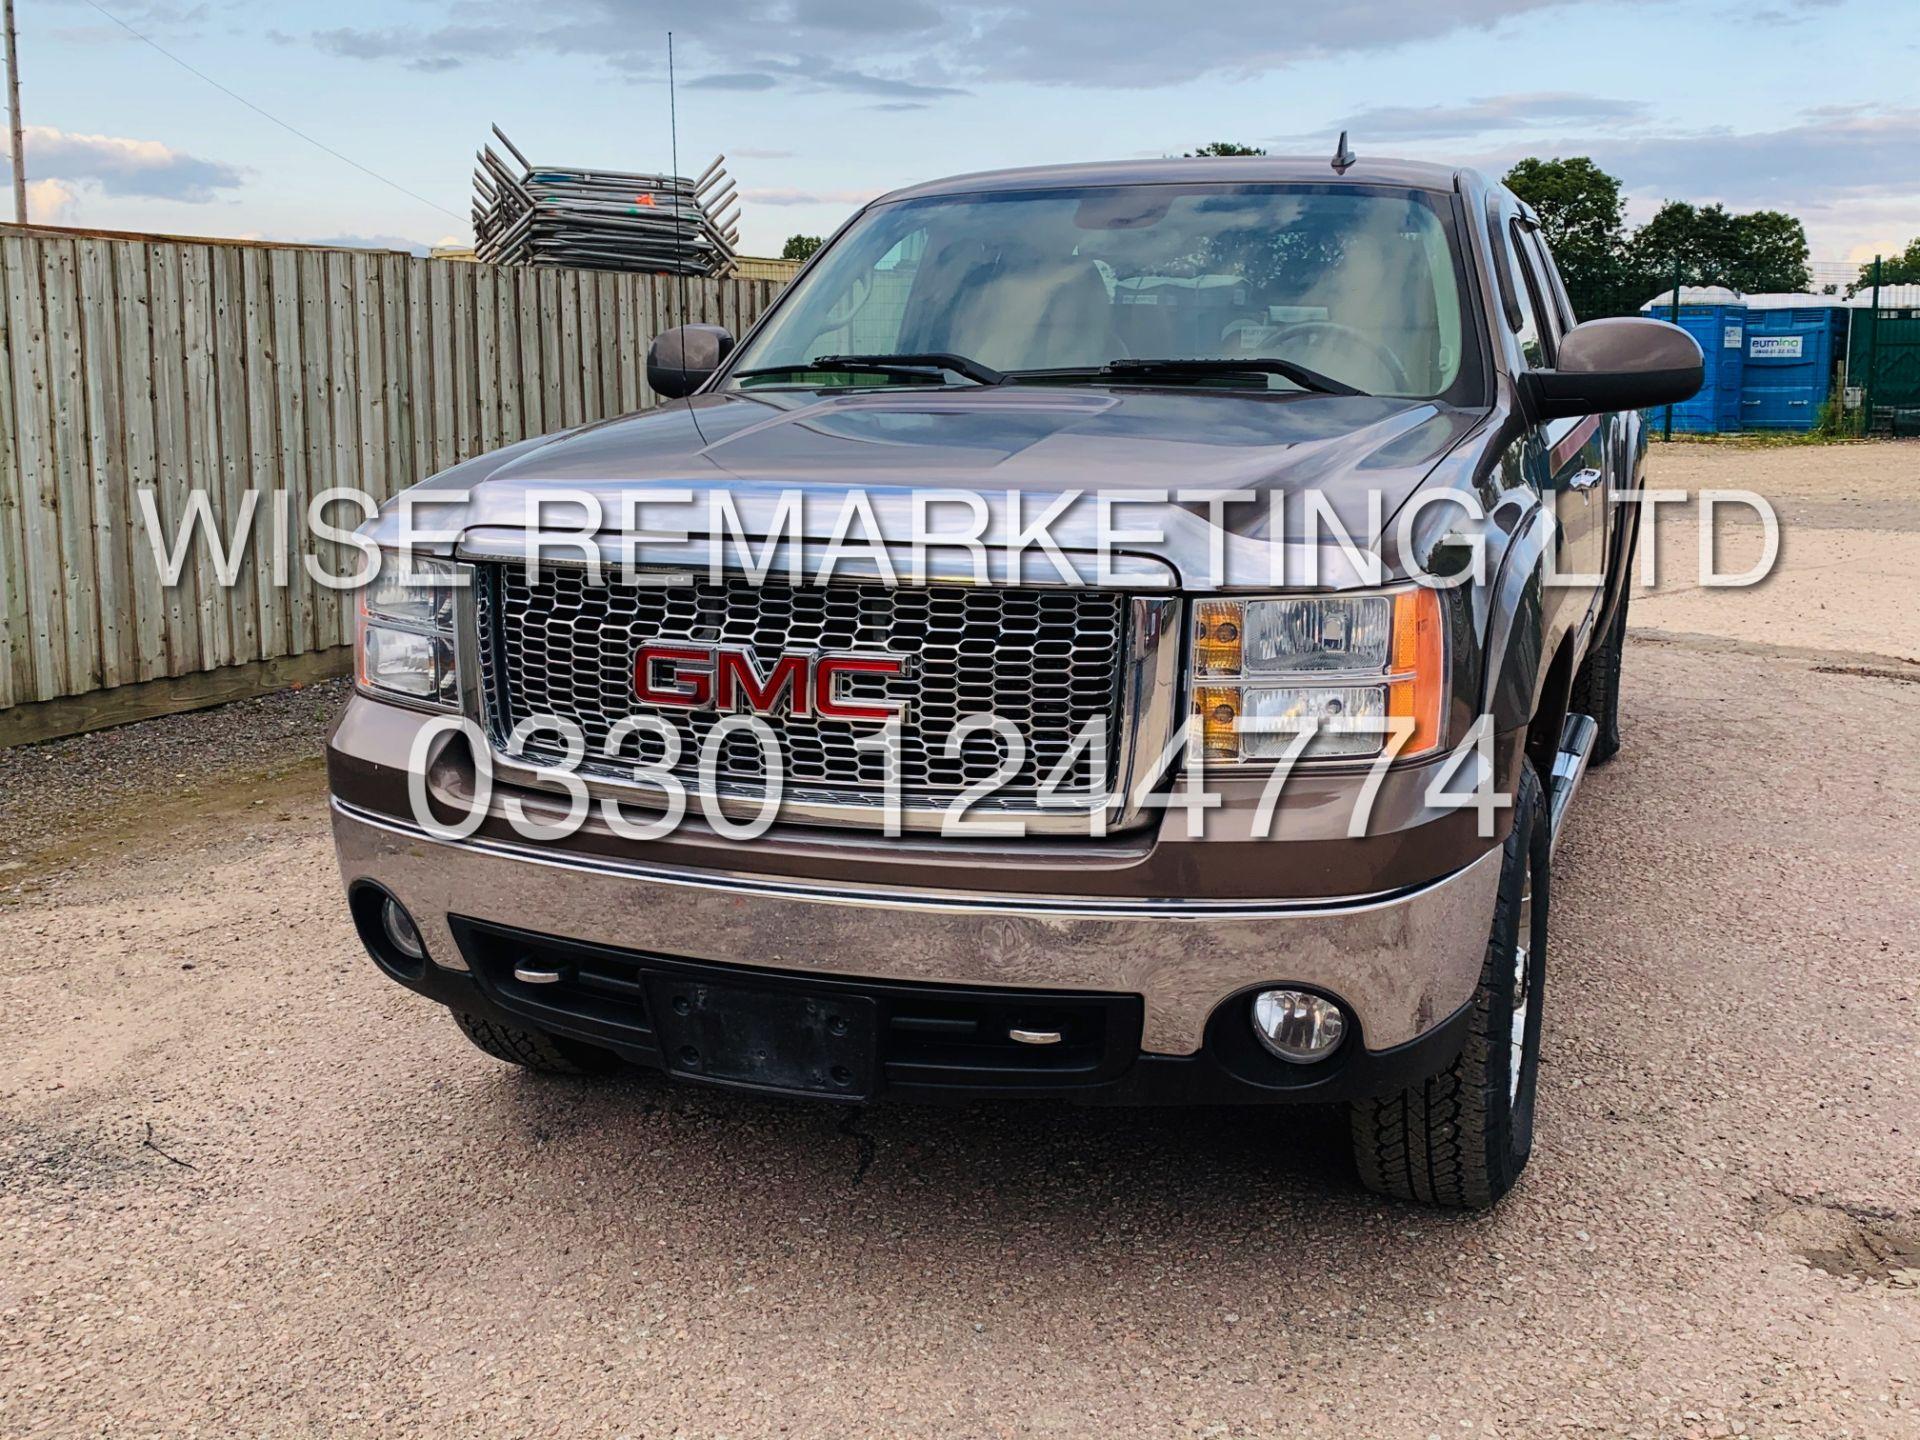 Lot 8A - GMC SIERRA 5.3L V8 SLT KING-CAB-5 SEATS**4X4**FRESH IMPORT**METALLIC BROWN**2007 YEAR**